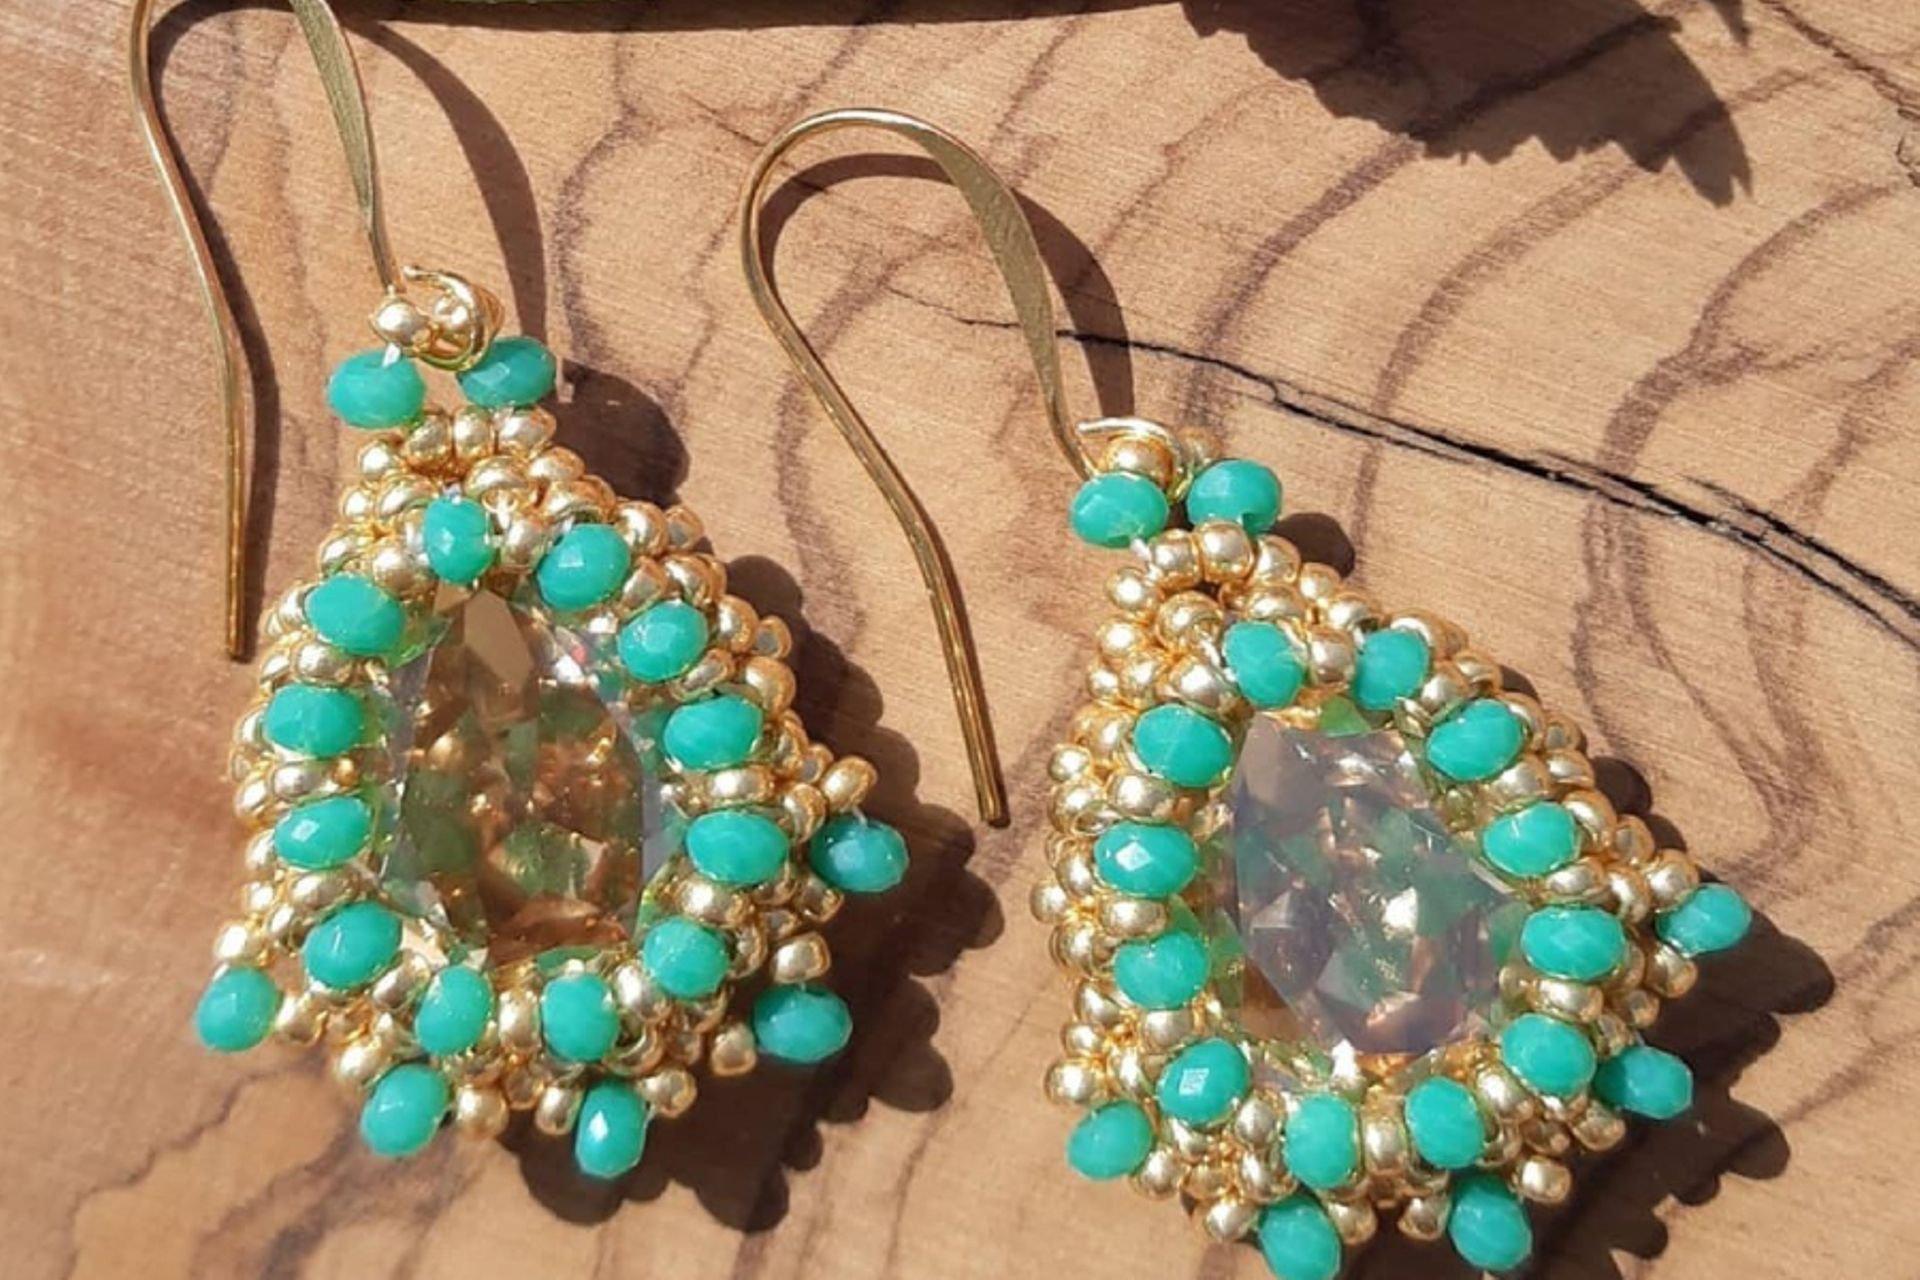 20 lantana beads jewelry designer תְמוּנָה